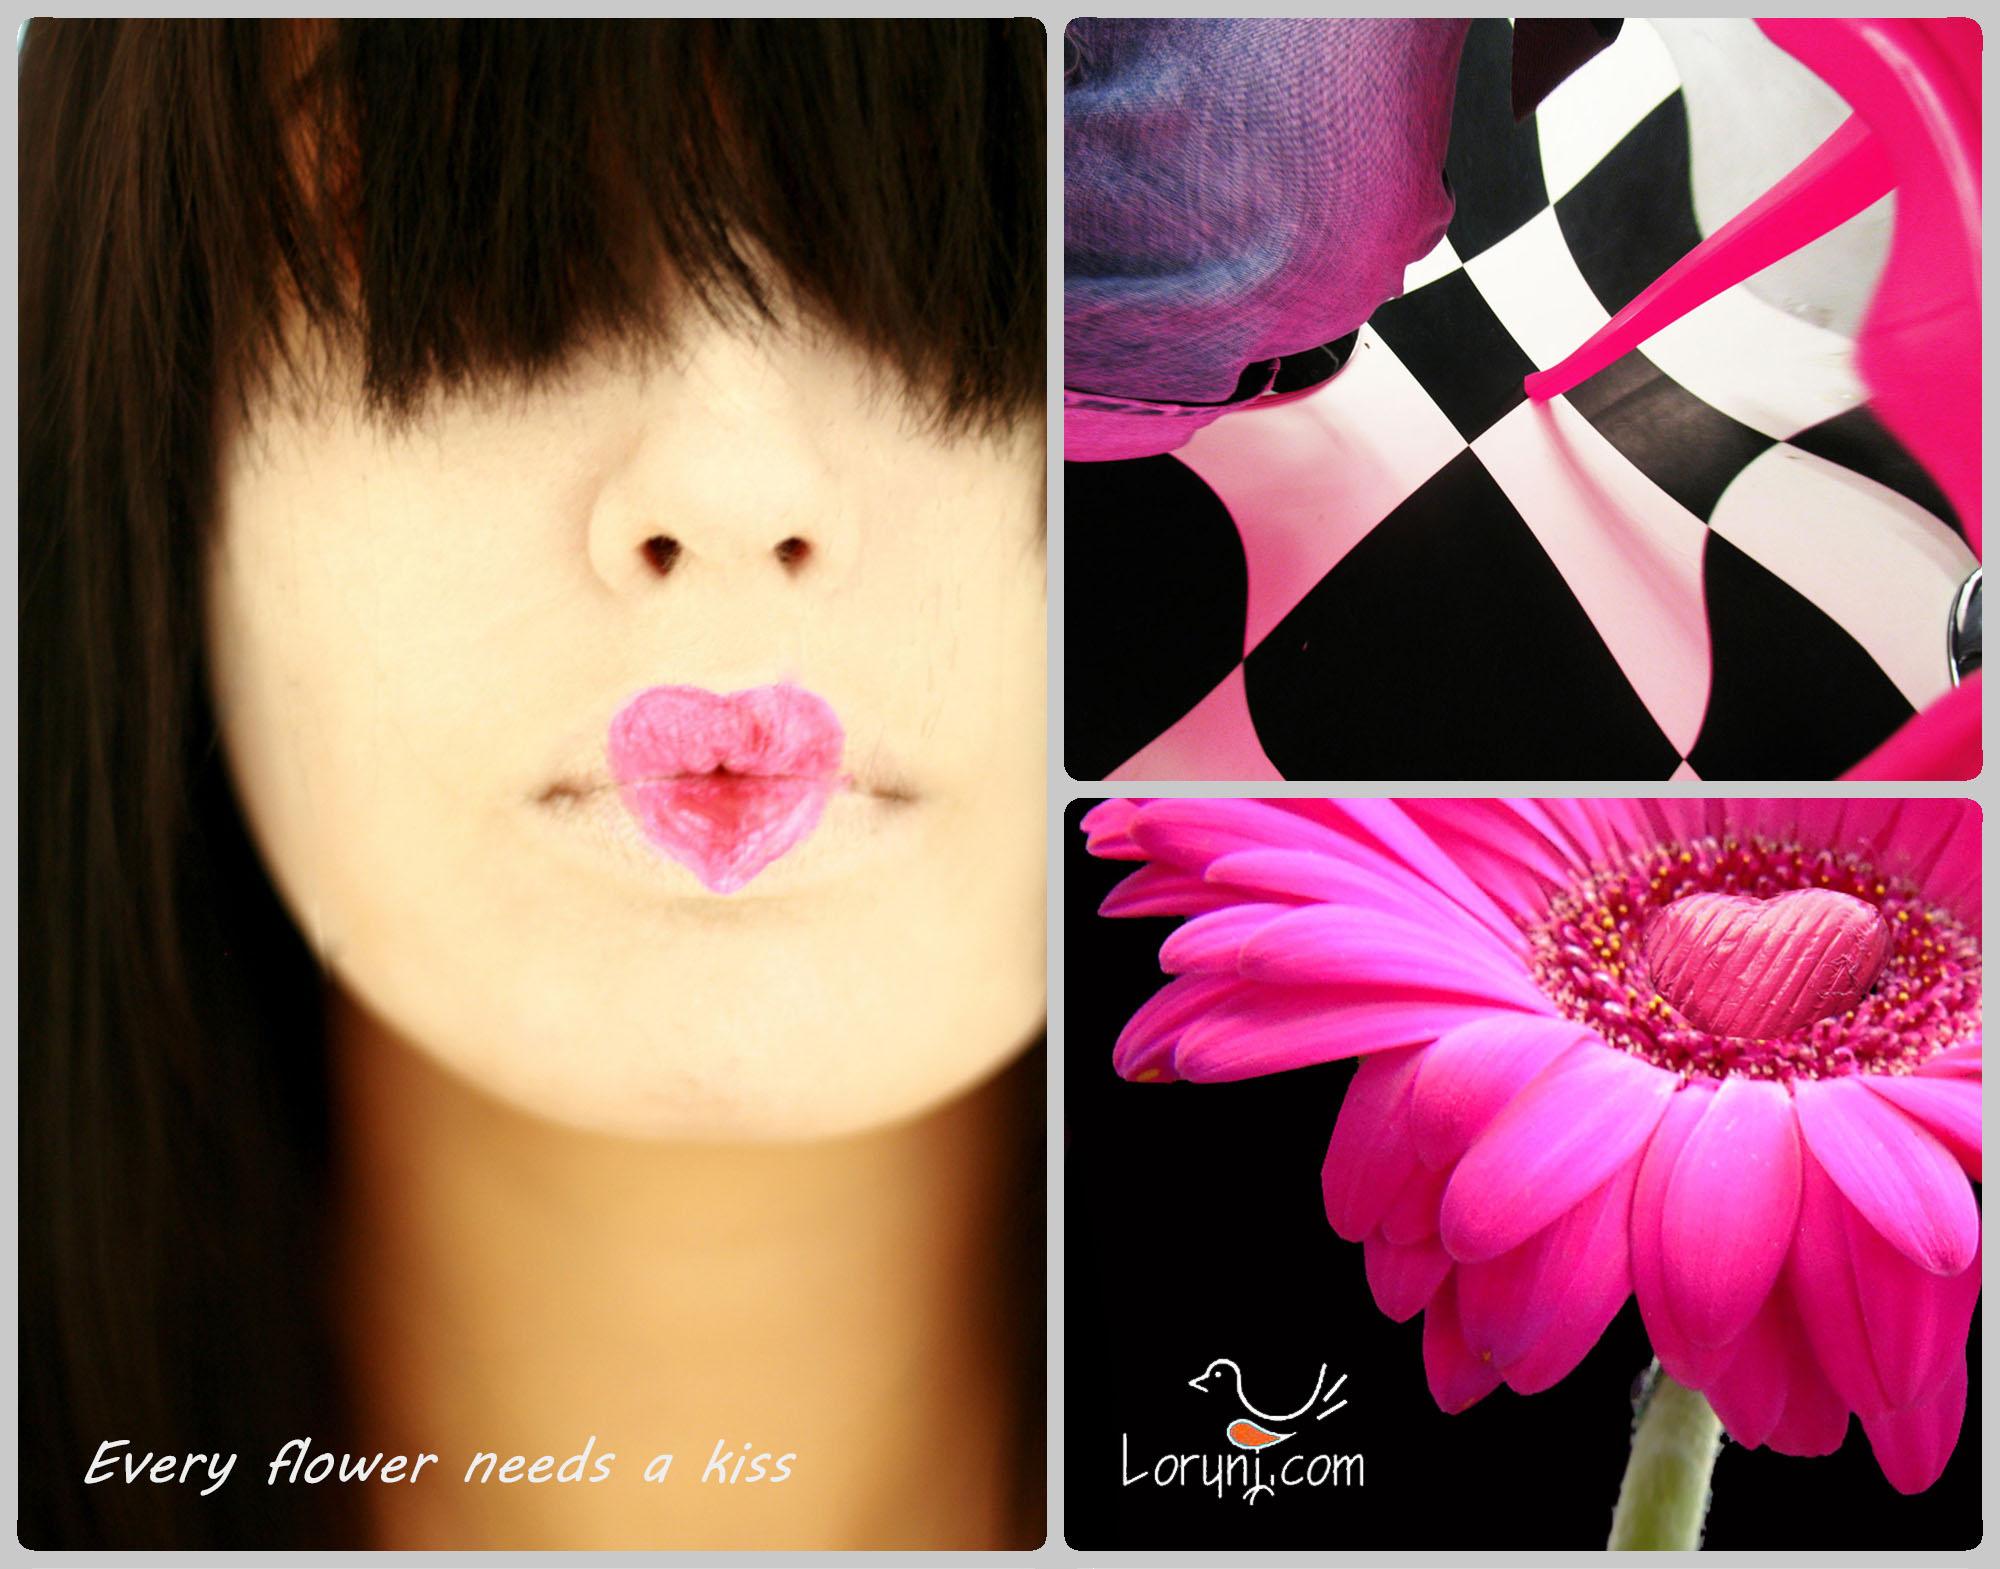 Every flower needs a kiss